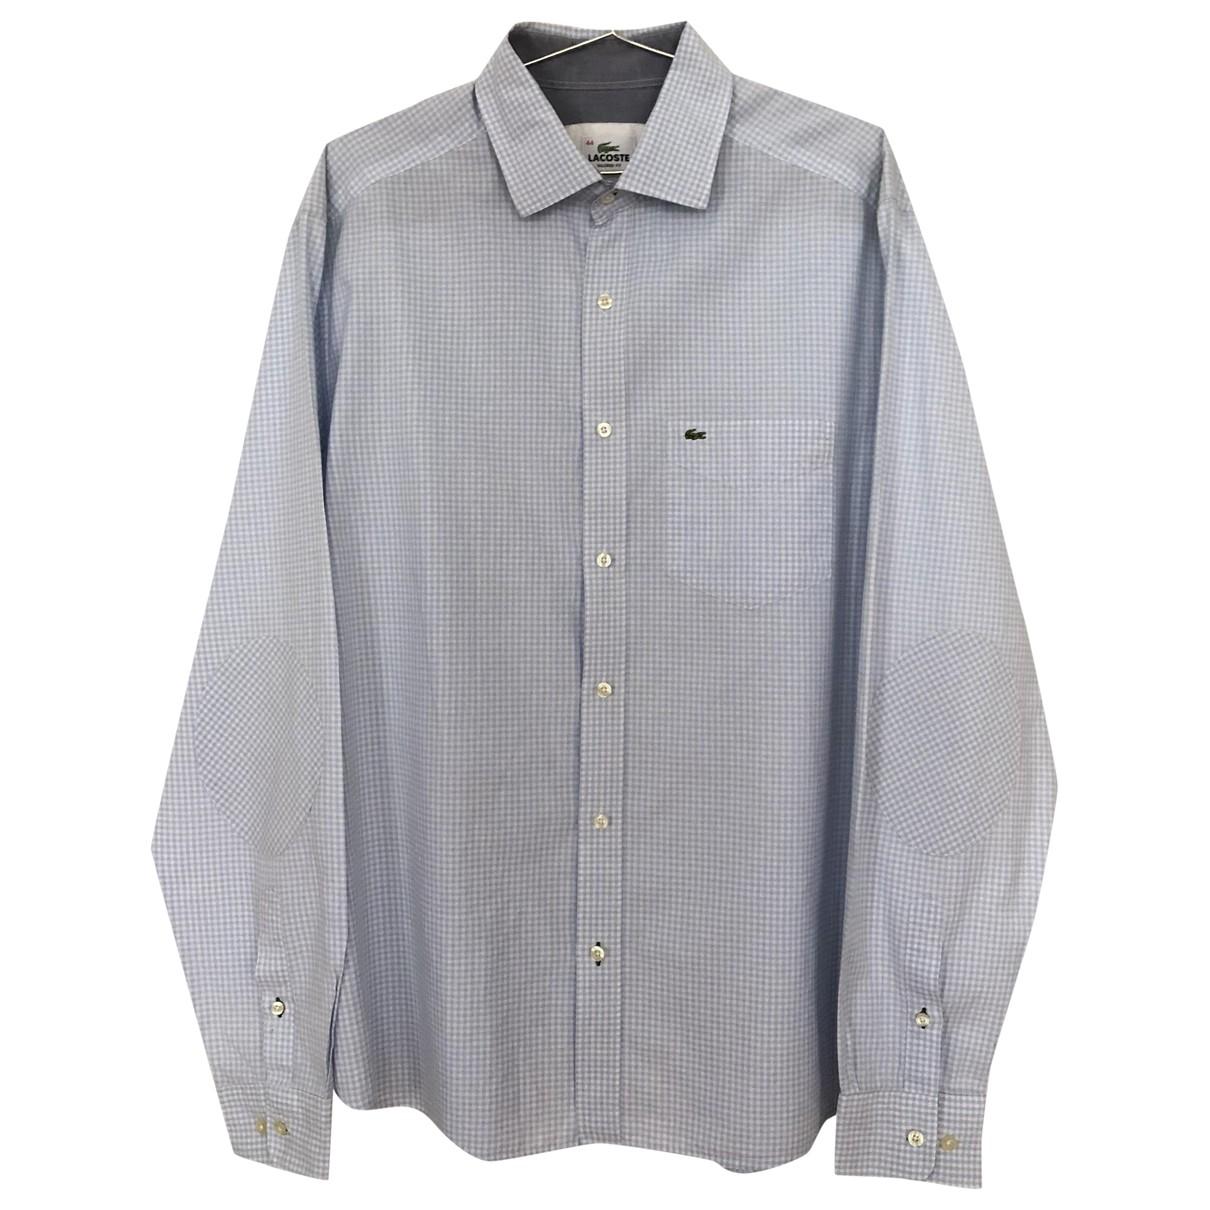 Lacoste \N Cotton Shirts for Men 44 EU (tour de cou / collar)